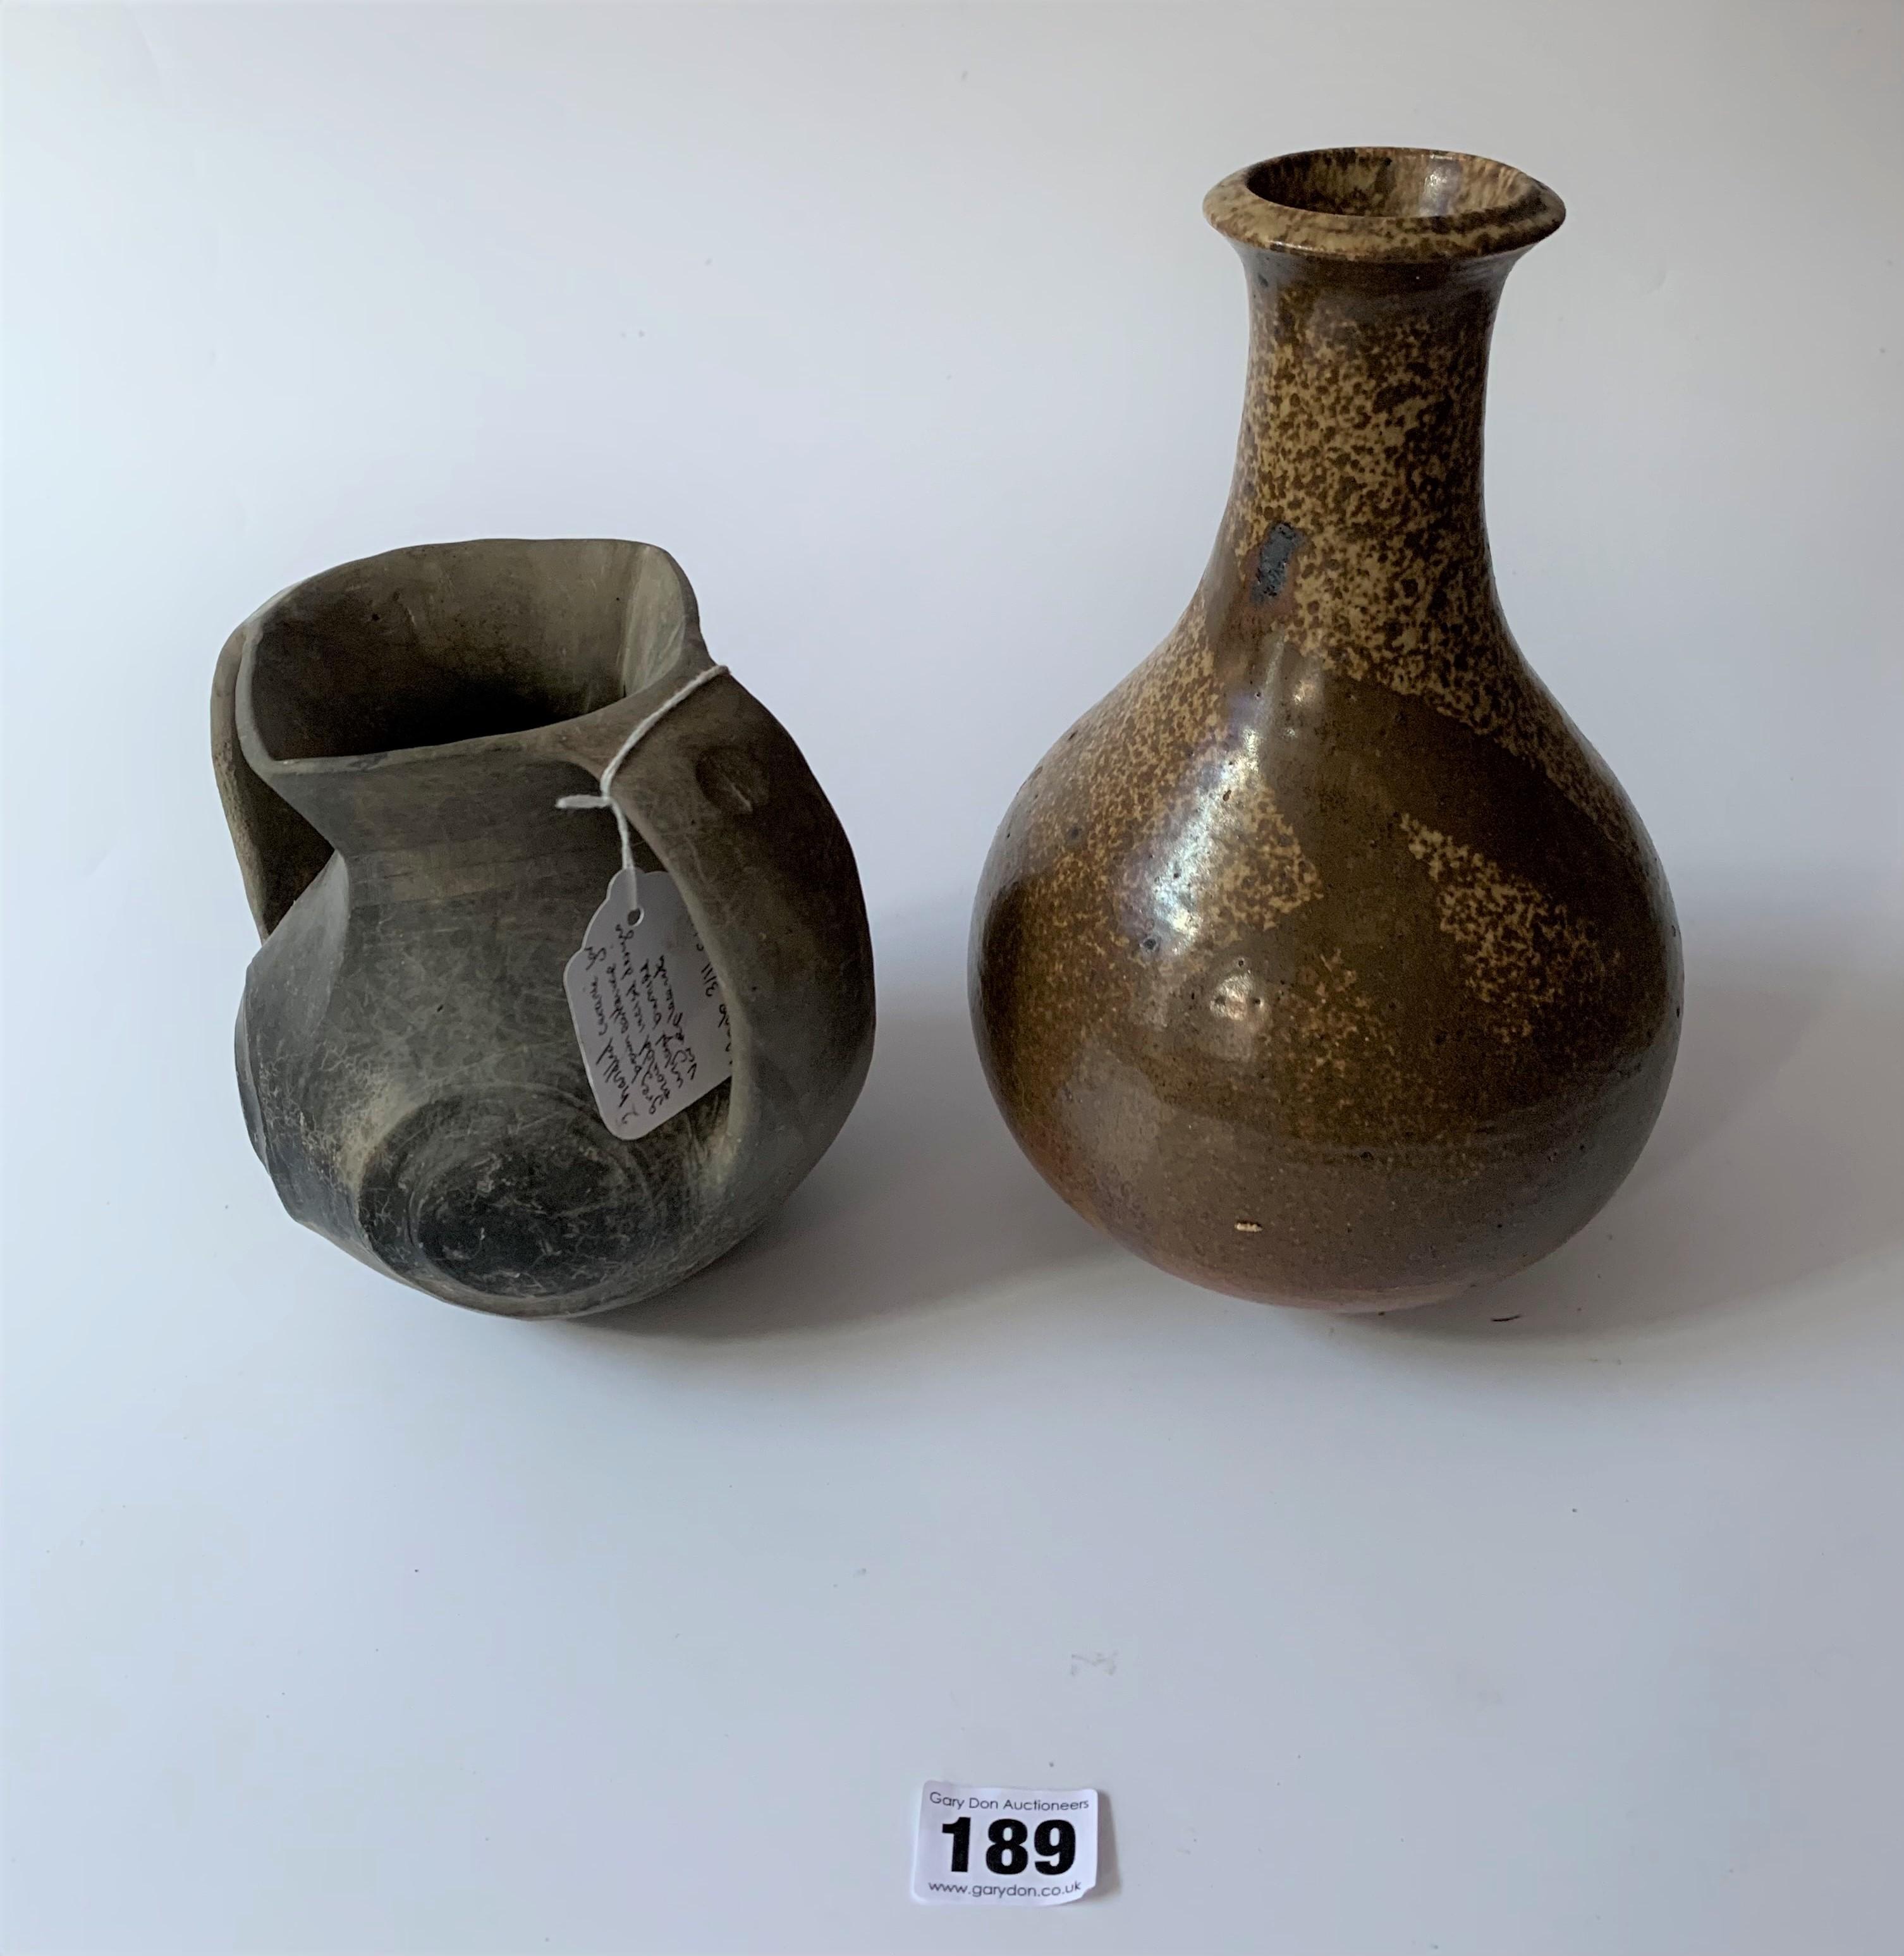 4 stoneware vases - Image 2 of 7